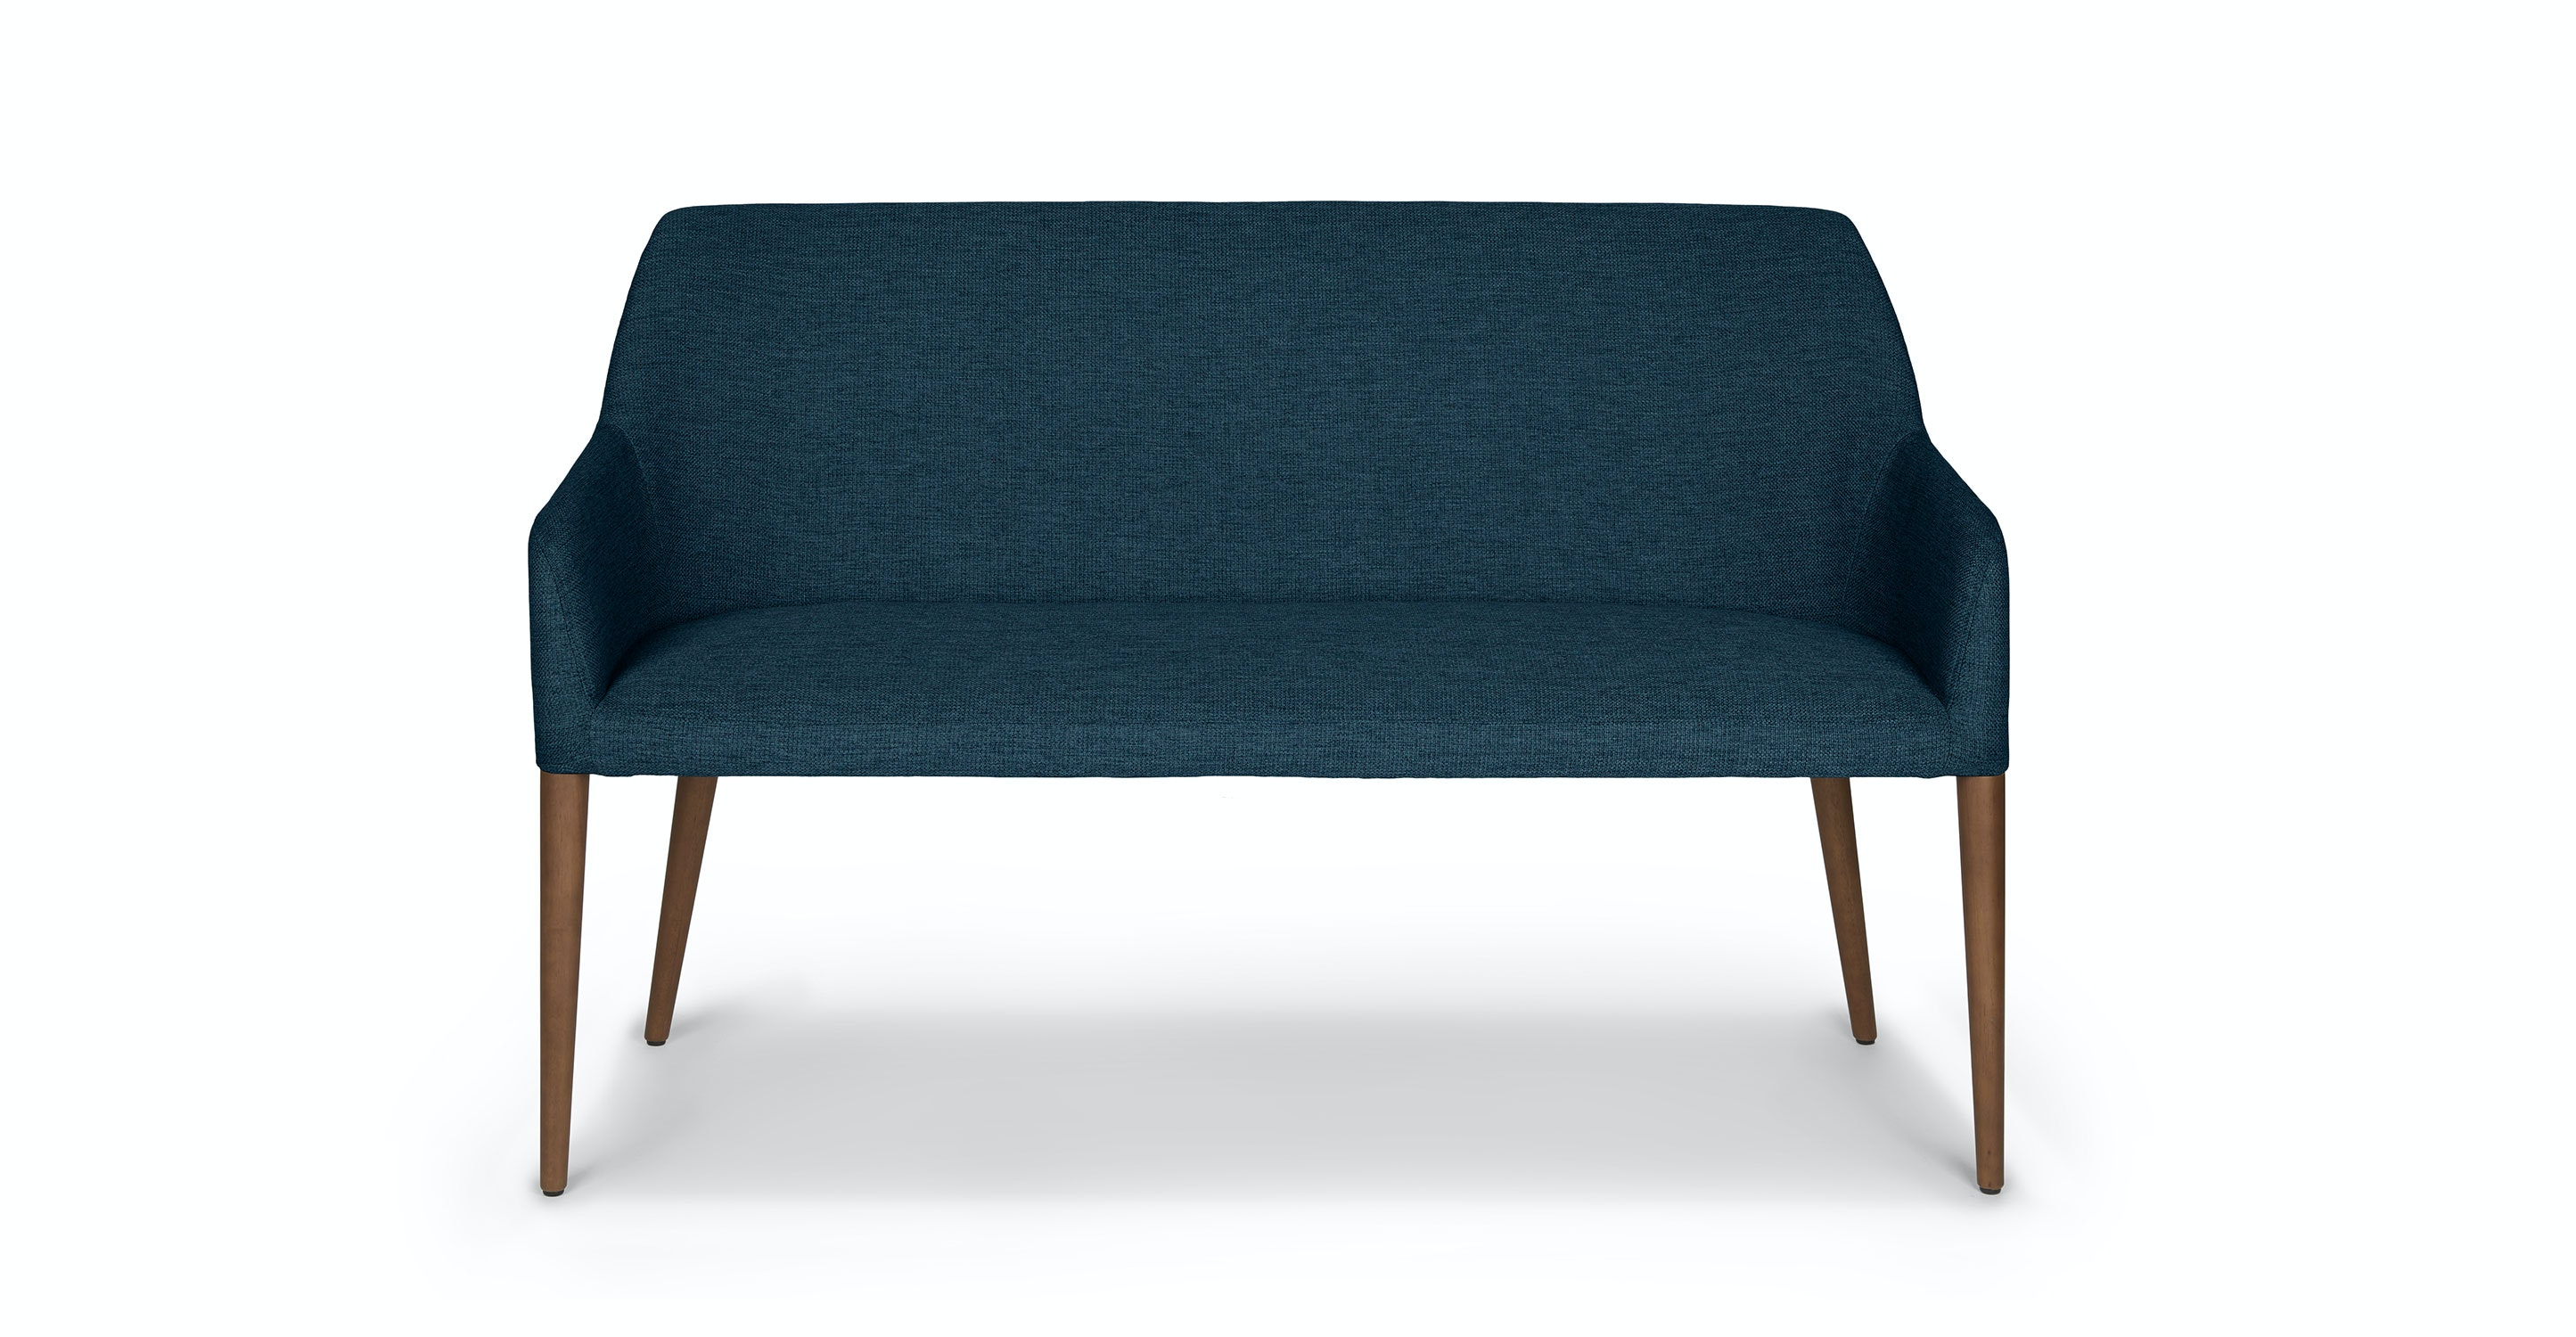 Pleasant Blue Fabric Dining Bench Solid Wood Legs Article Feast Modern Furniture Machost Co Dining Chair Design Ideas Machostcouk